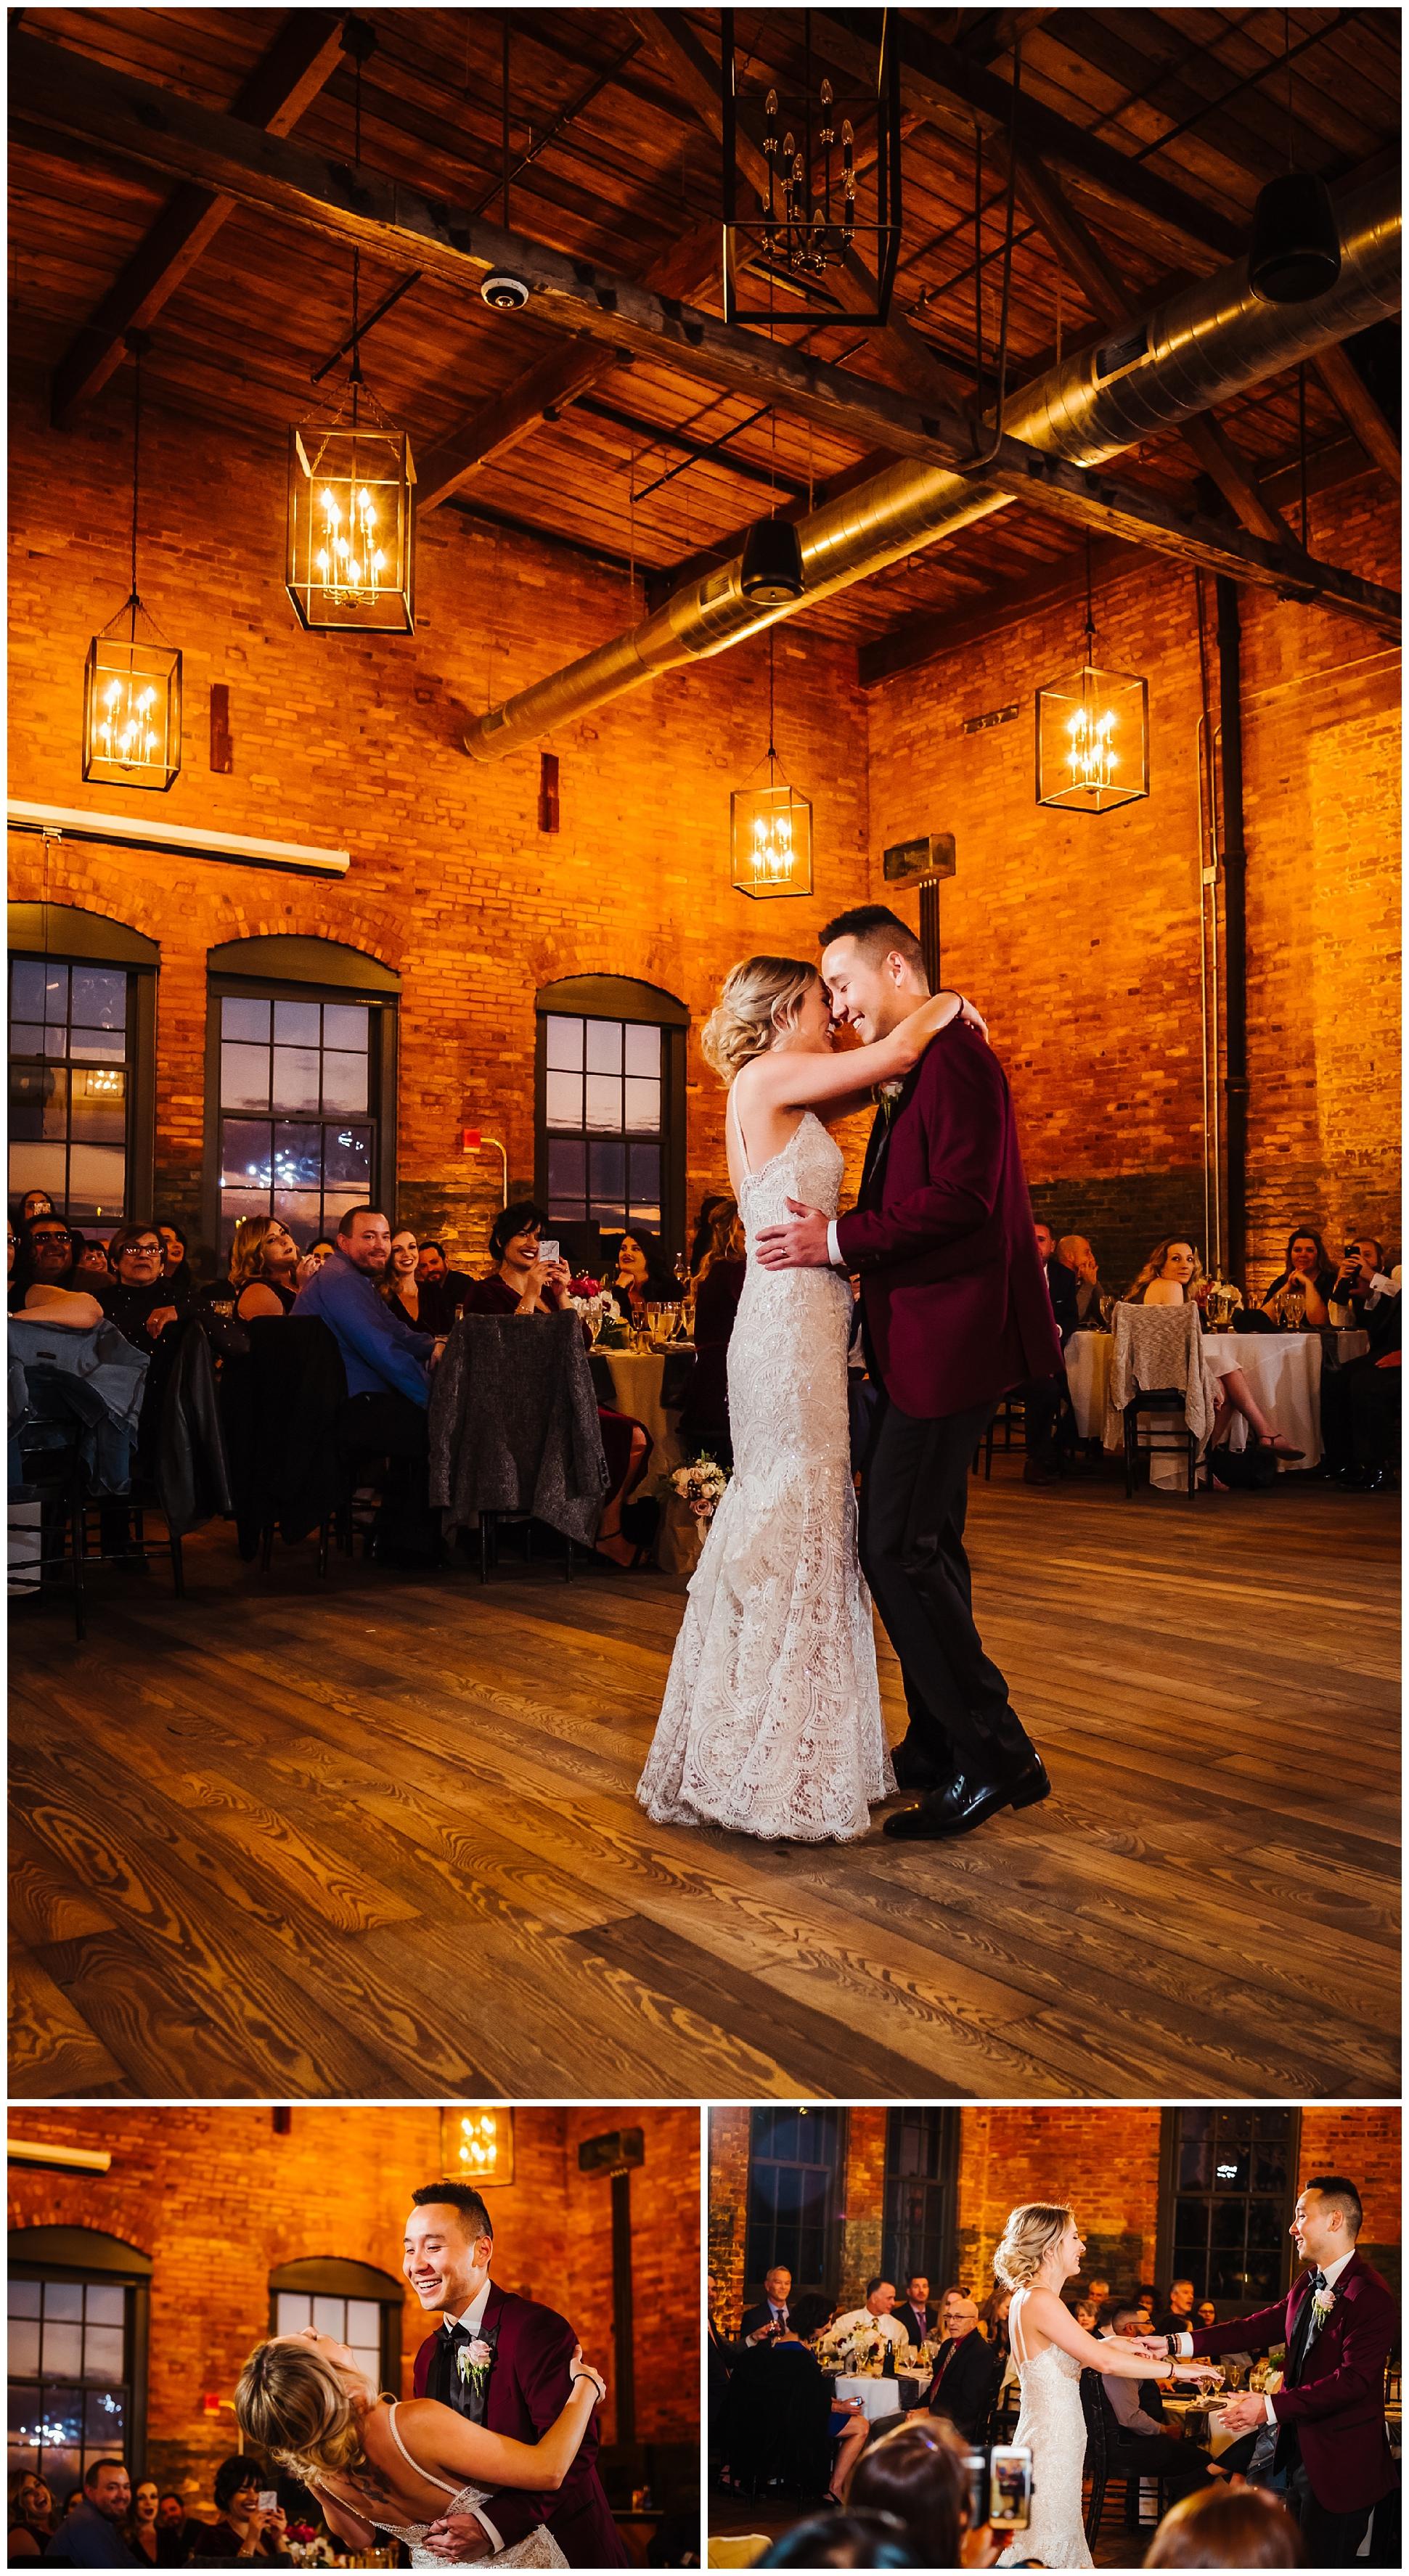 tampa-armeture-wedding-photographer-edgy-industrial-downtown-fancy-free-nursery-tattoo-burgandy-velvet_0071.jpg